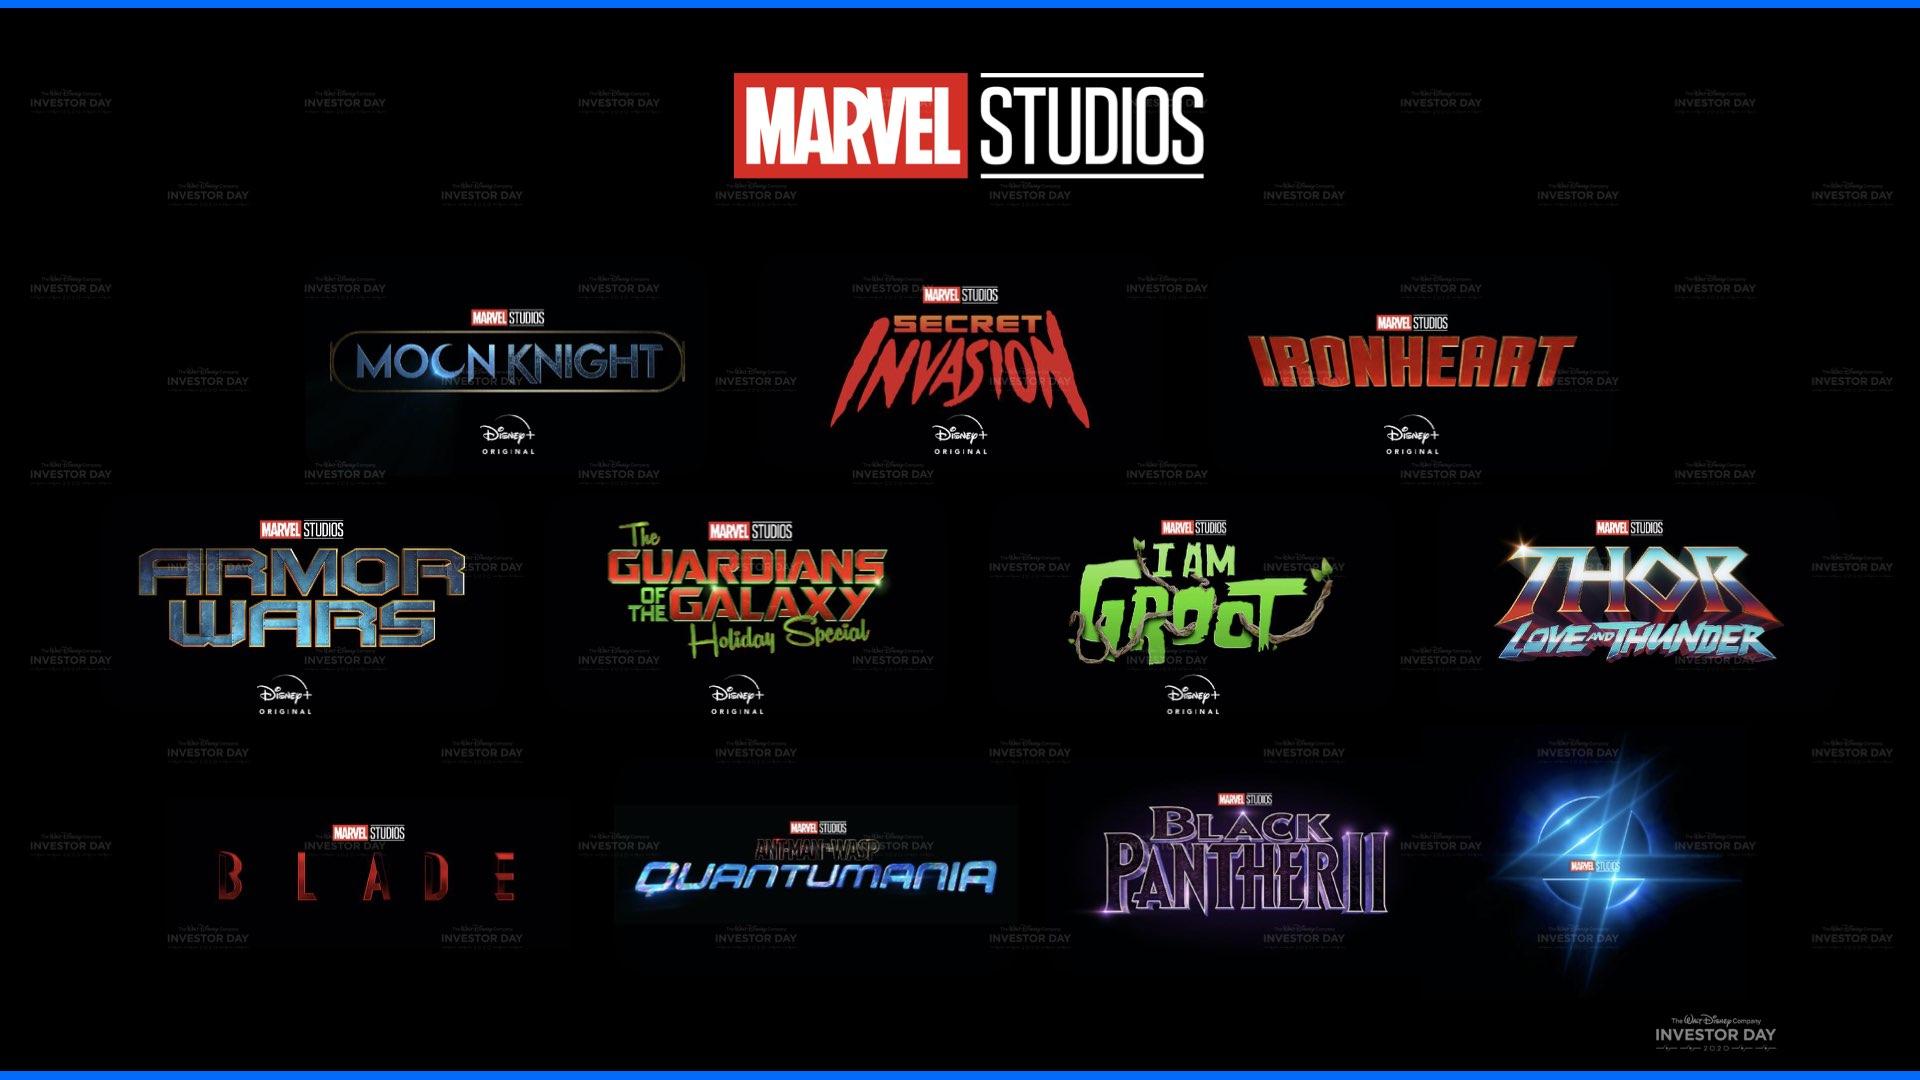 Marvel Studios 2